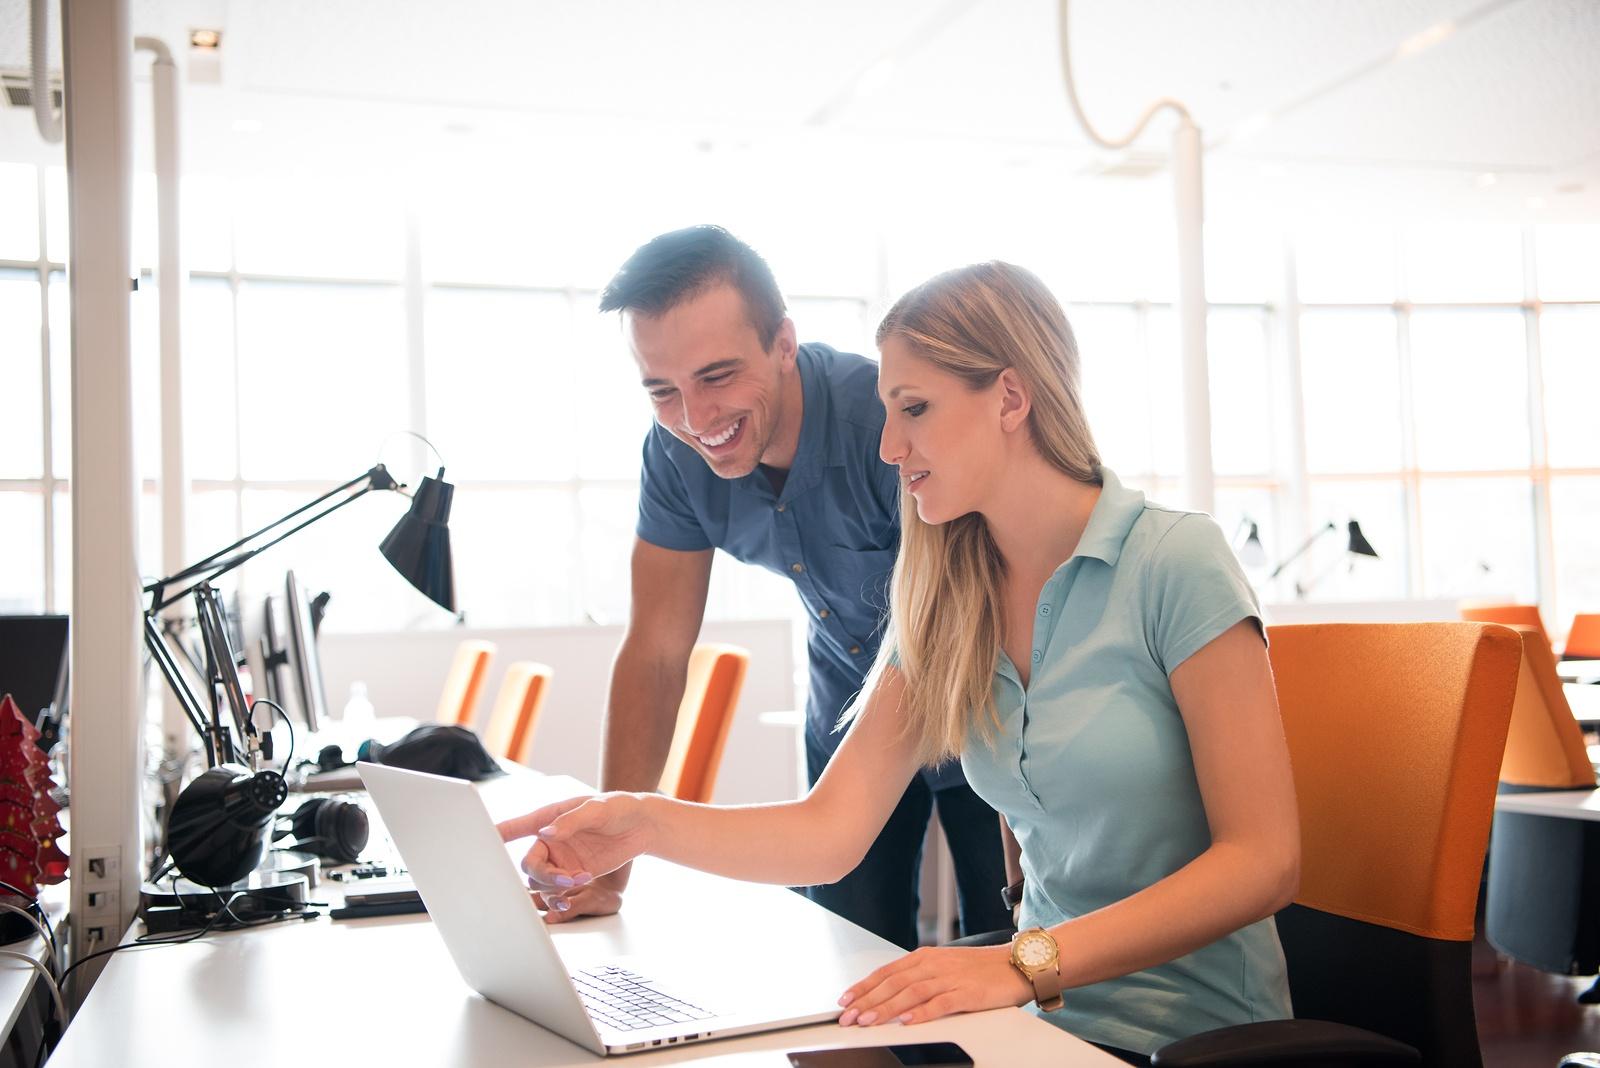 bigstock-Group-of-young-people-employee-168467225